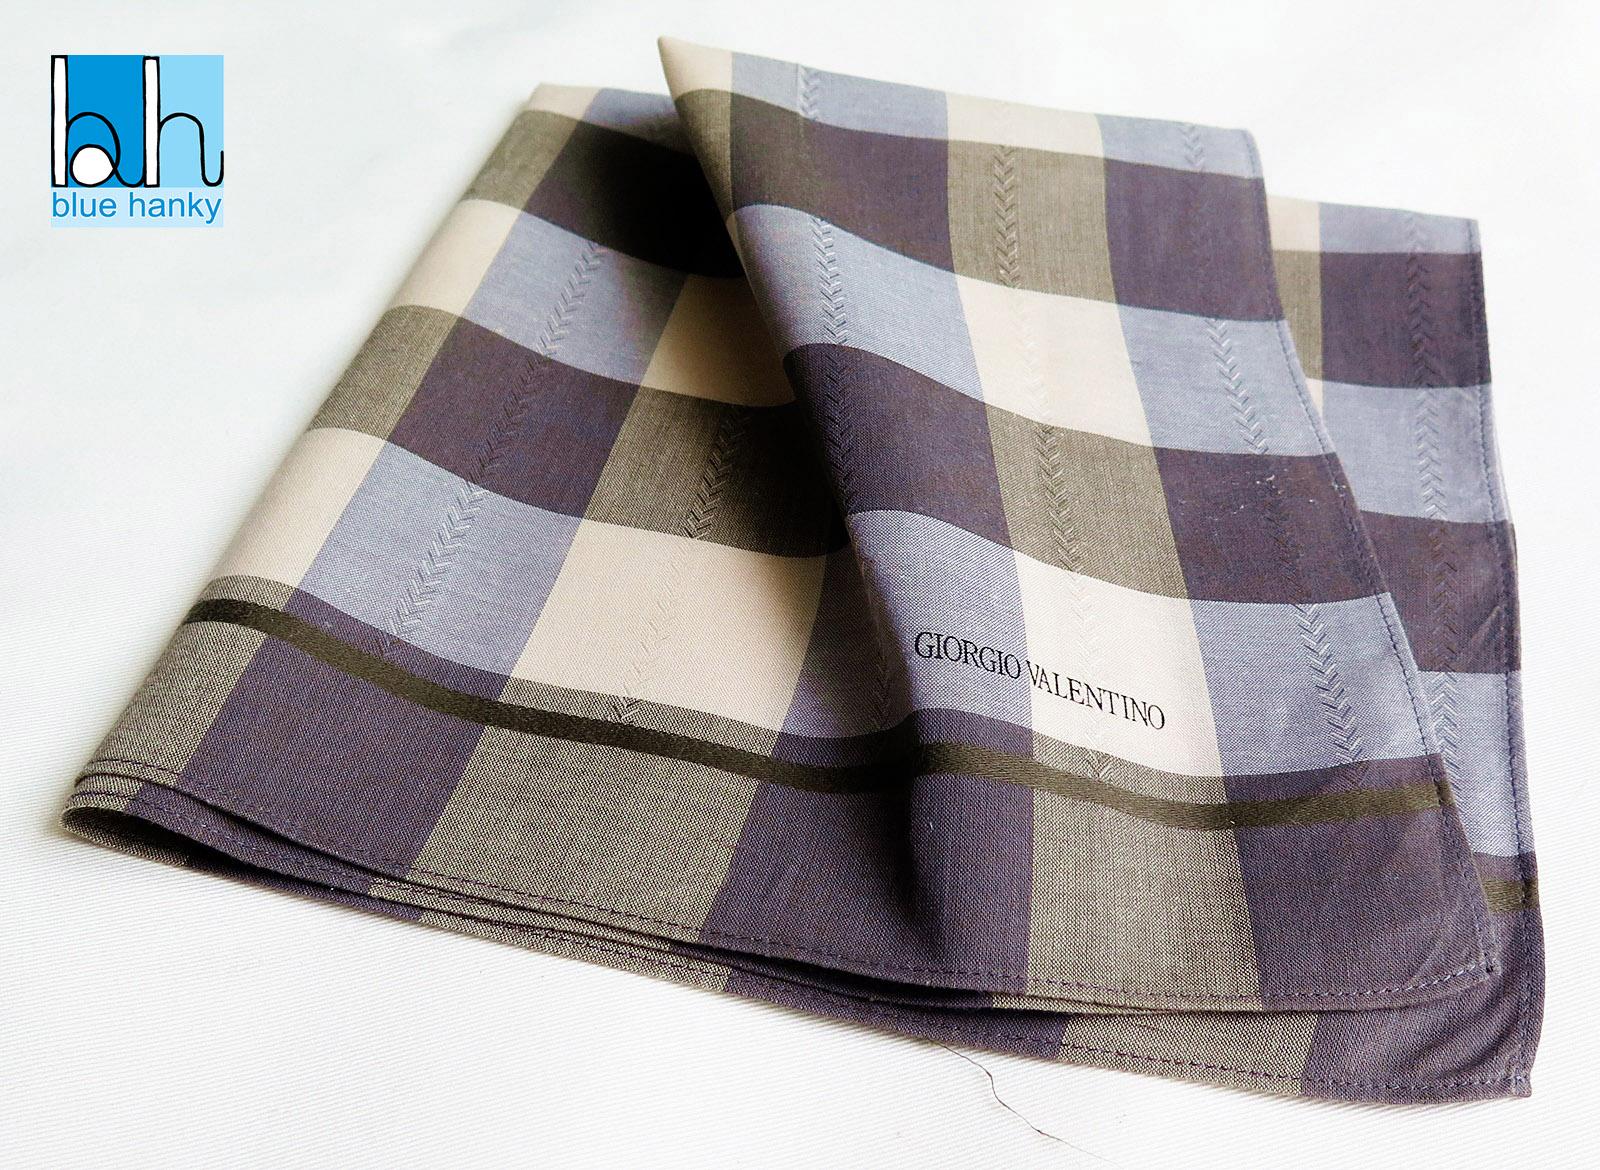 "#62 18"" GIORGIO VALENTINO ผ้าเช็ดหน้ามือ2 สภาพดี ผ้าเช็ดหน้าผืนใหญ่"